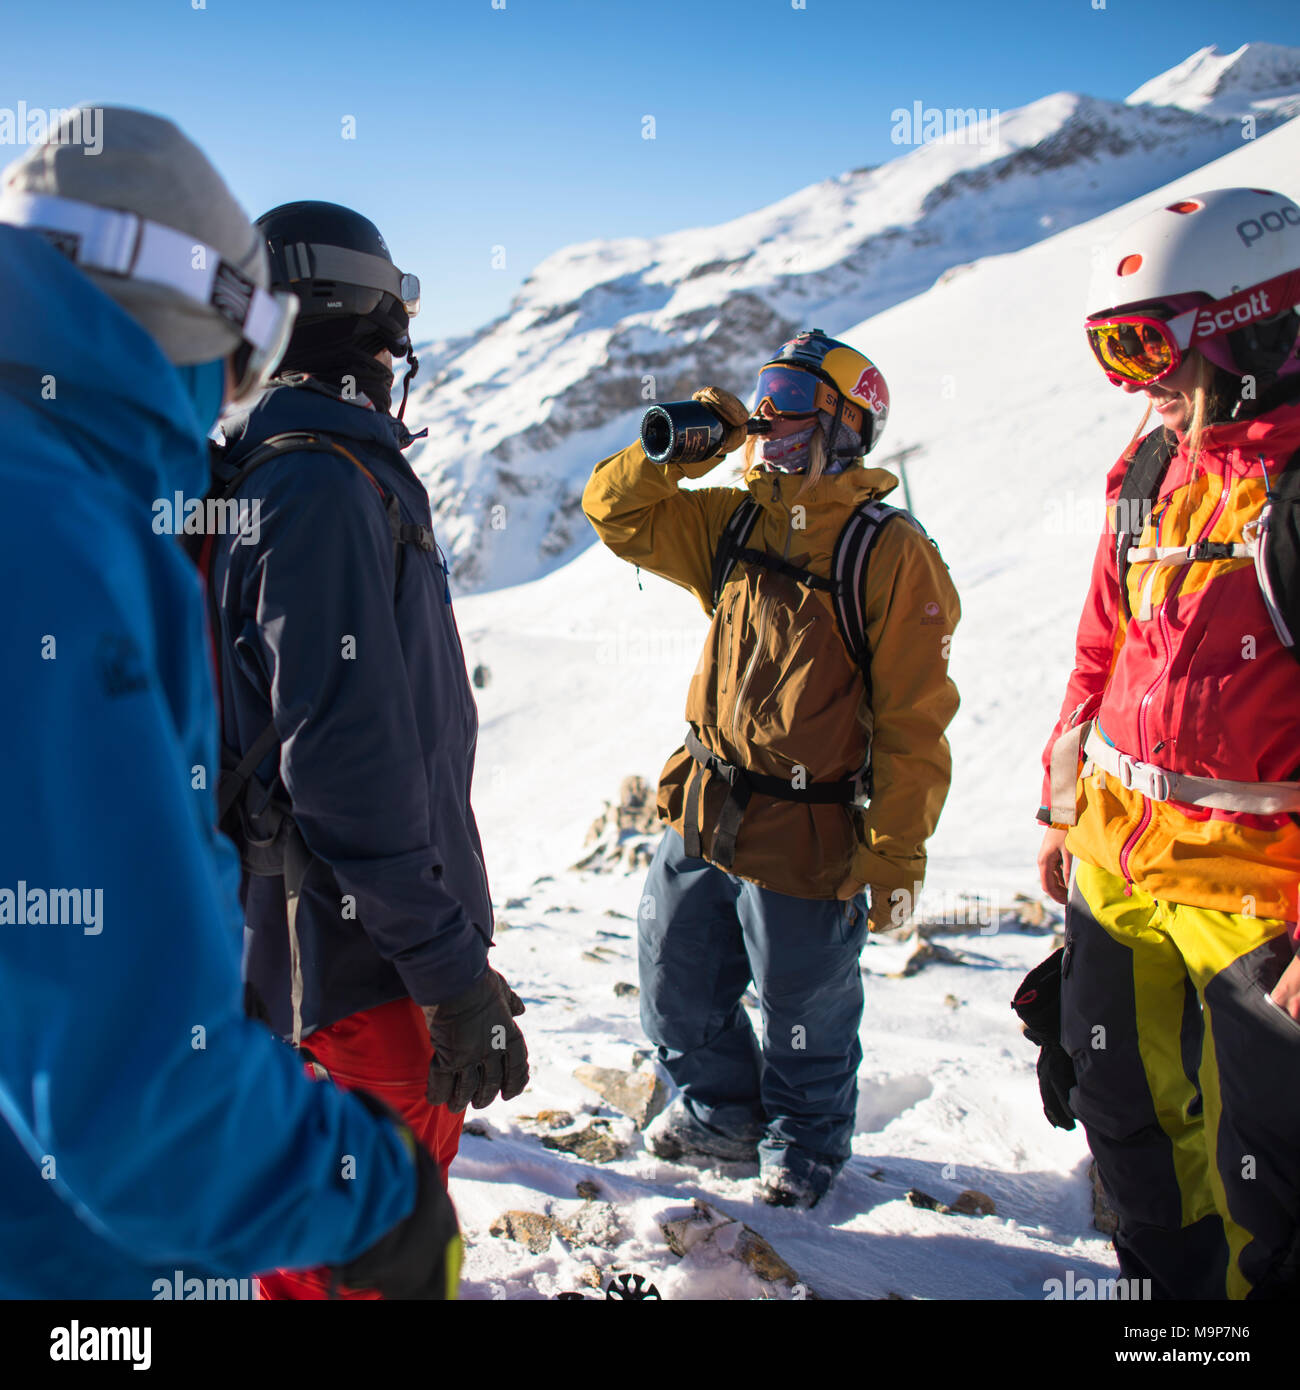 Professional skiers wearing skiwear, one drinking, Monterosa Ski mountain resort in Gressoney, Aosta, Italy - Stock Image